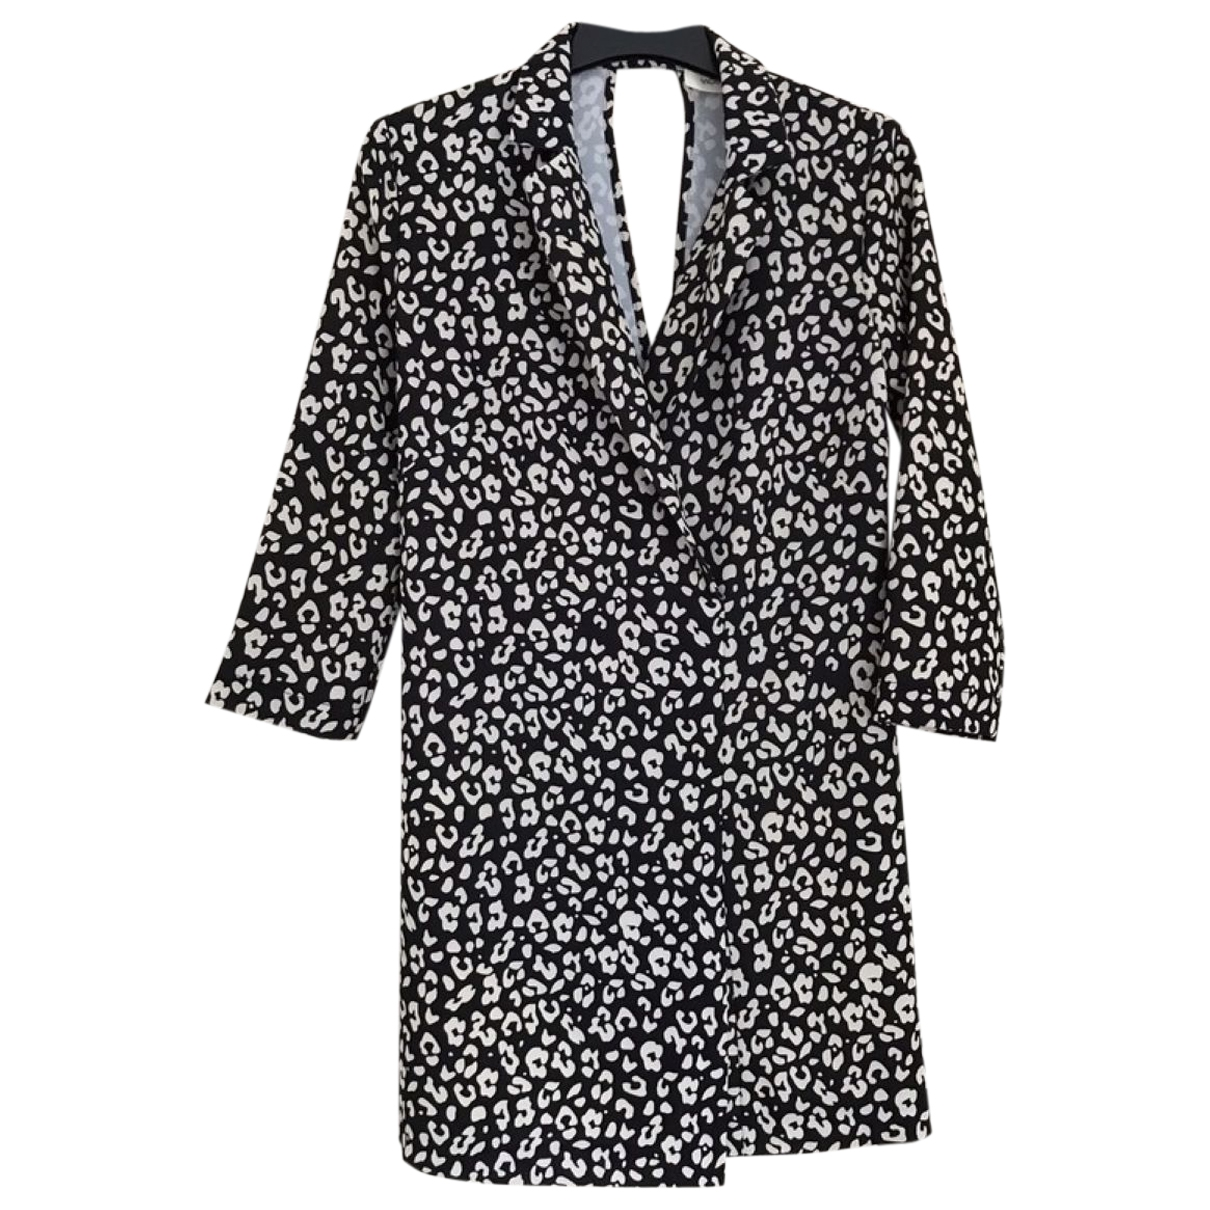 Vicolo \N Black dress for Women 36 FR